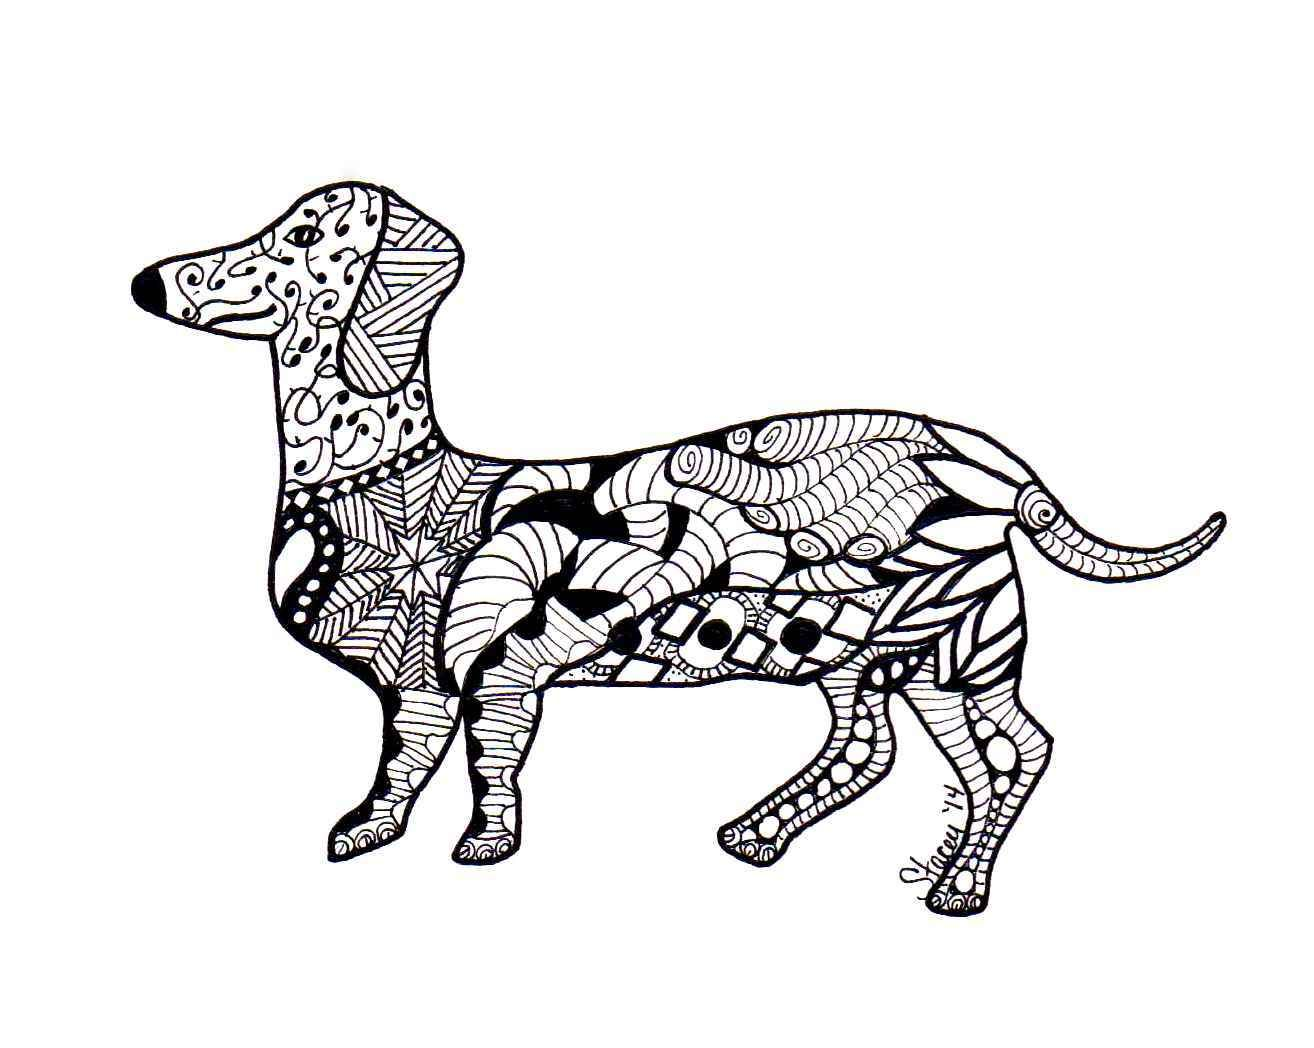 Zentangle Dachshund | Designs by Stacey Lynn | Pinterest | Mandalas ...